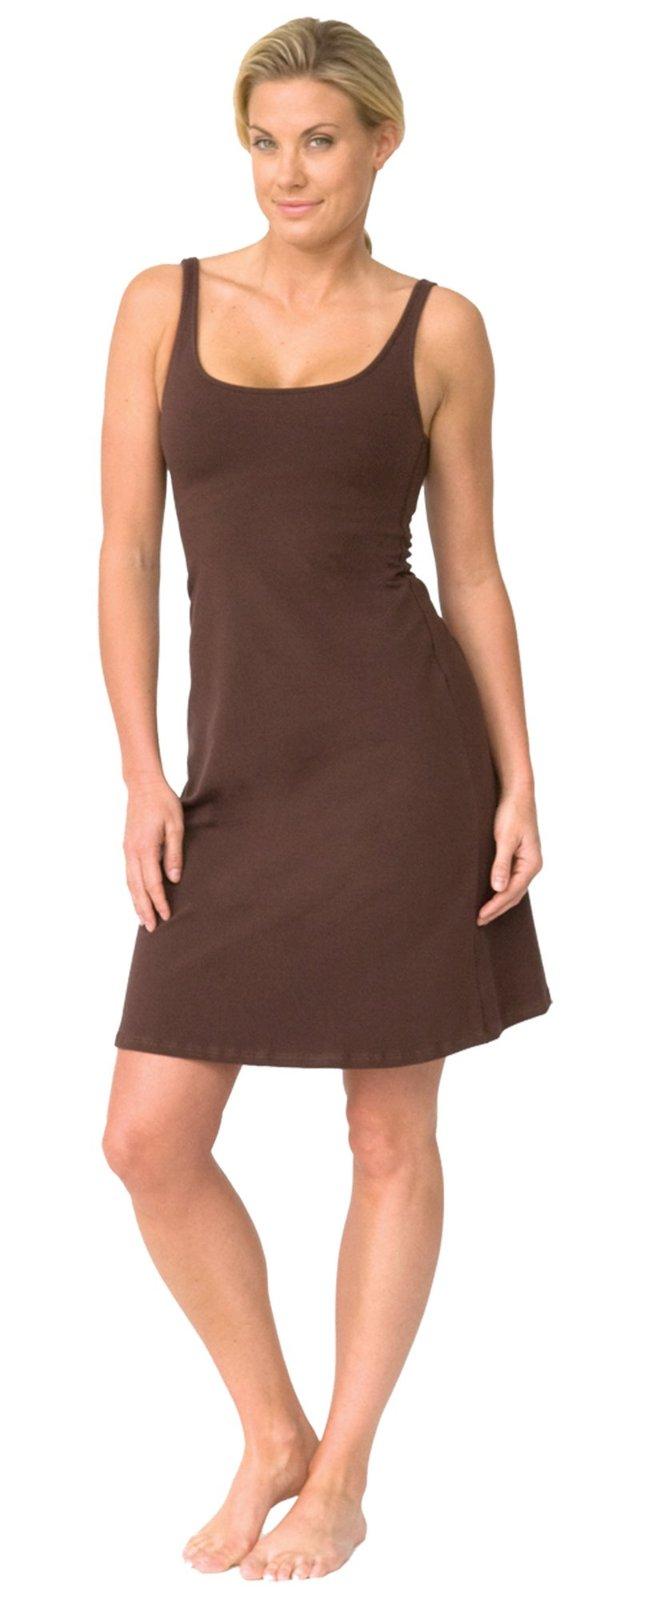 majamas-cozy-nursing-dress-cocoa.jpg